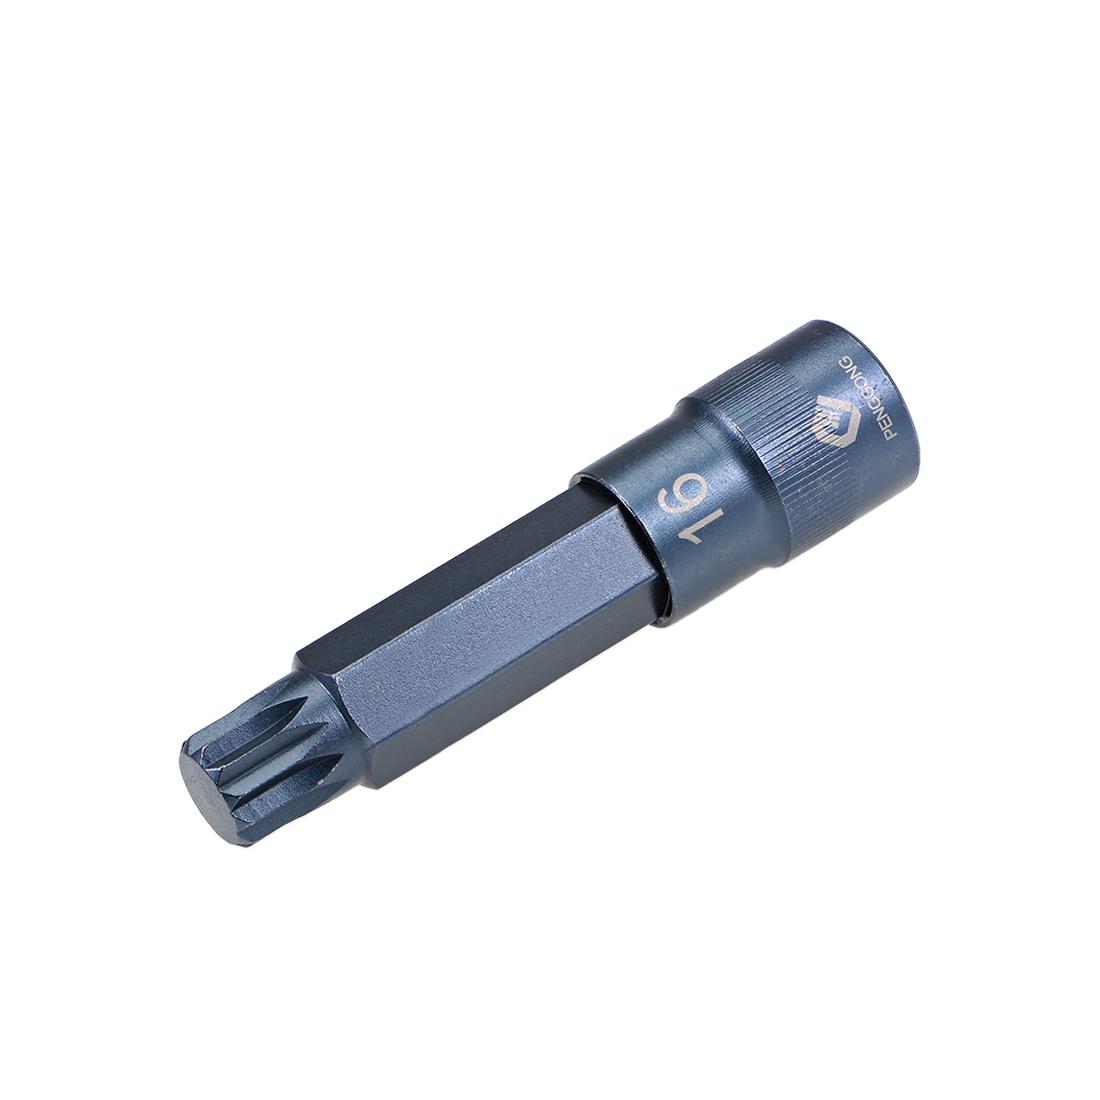 "1/2-Inch Drive x M16 Triple Square Spline Bit Socket, Metric 4"" Length"